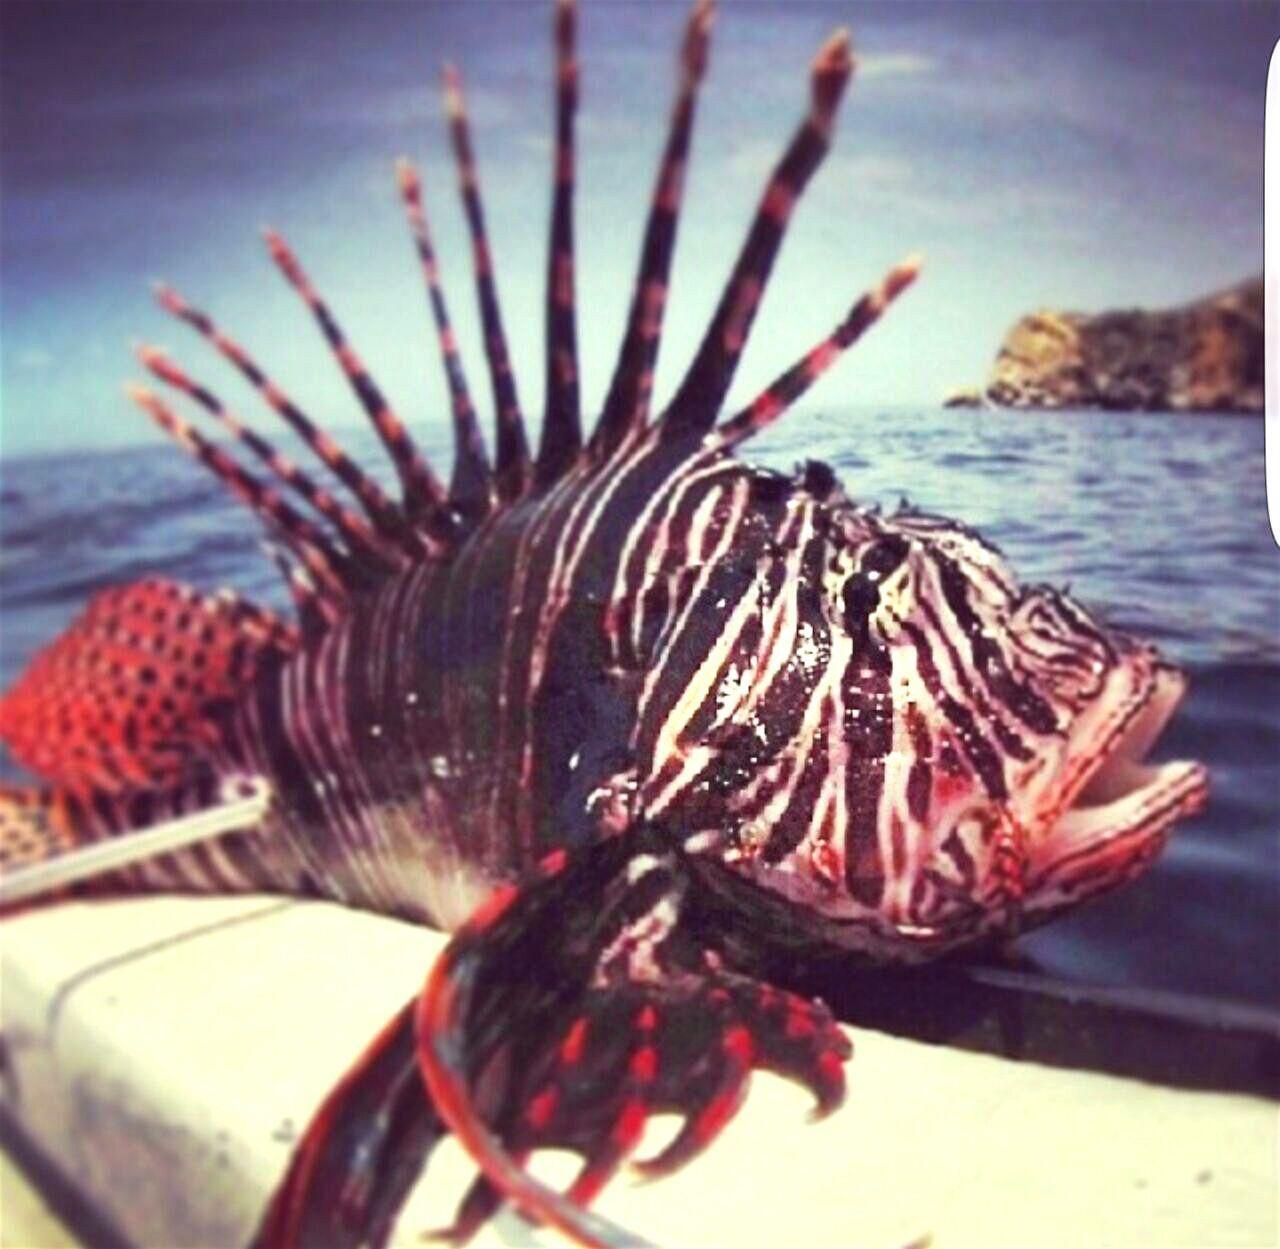 The Great Outdoors - 2017 EyeEm Awards Pezleon One Animal Seafood Water PescaSubaquática Spearfishing Seascape Photography Cumaná Mochima Underwater UnderSea